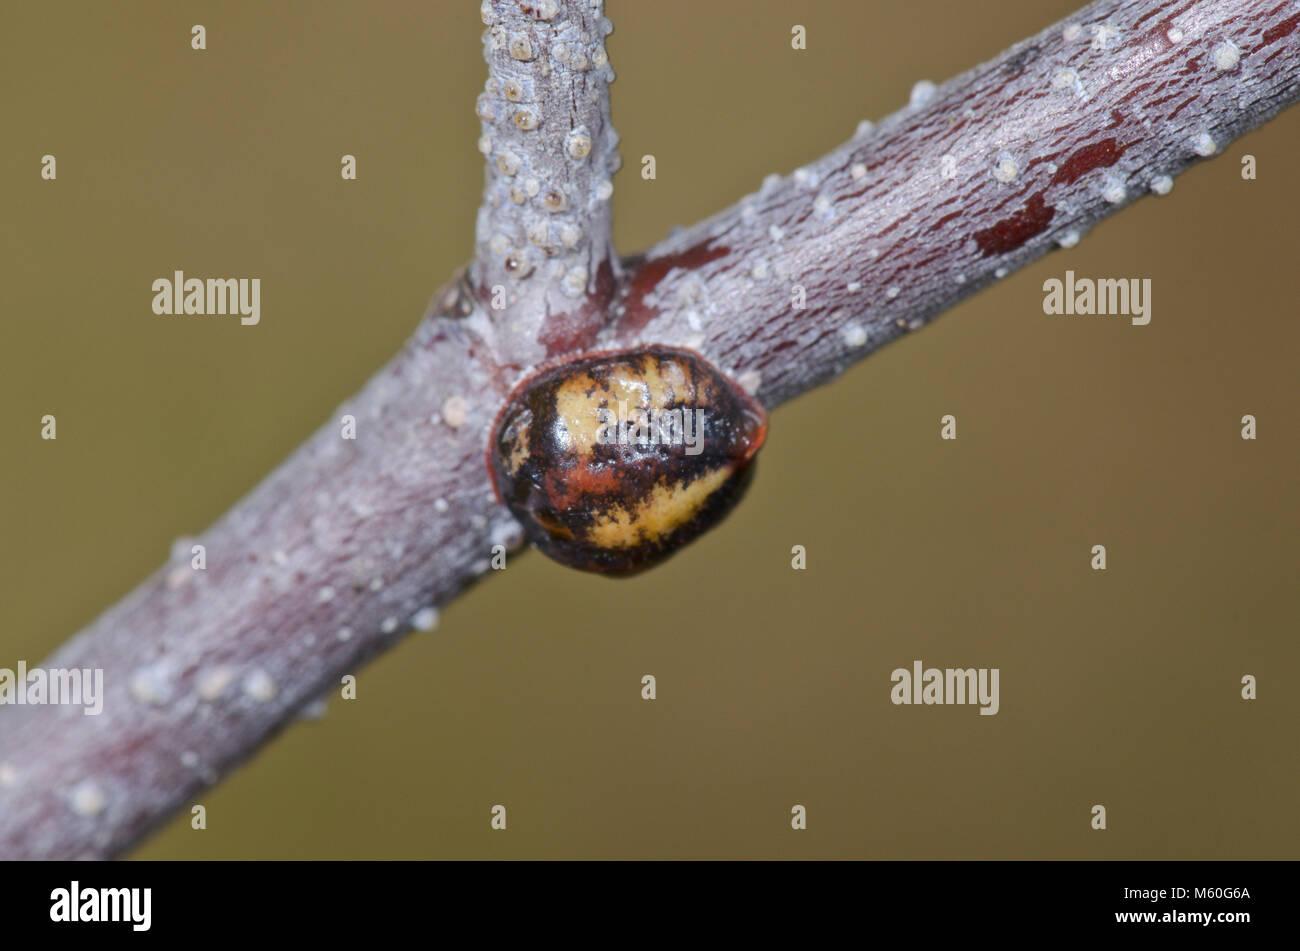 Nut Scale Insect ( Eulecanium tiliae ), Coccidae. Sussex, UK - Stock Image